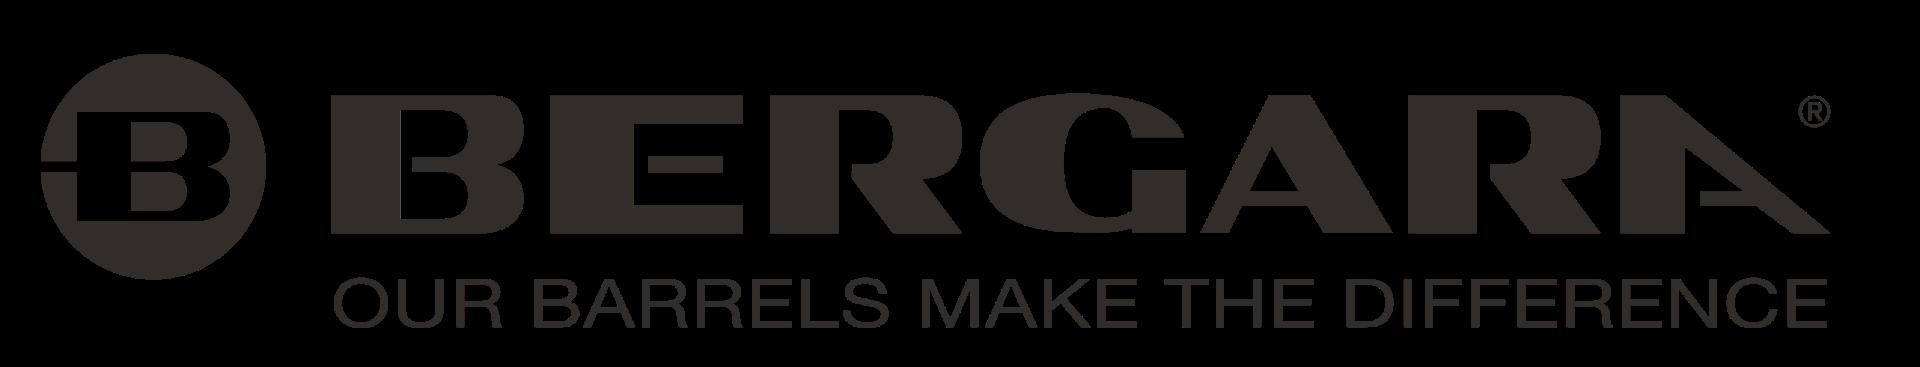 bergara-rifles